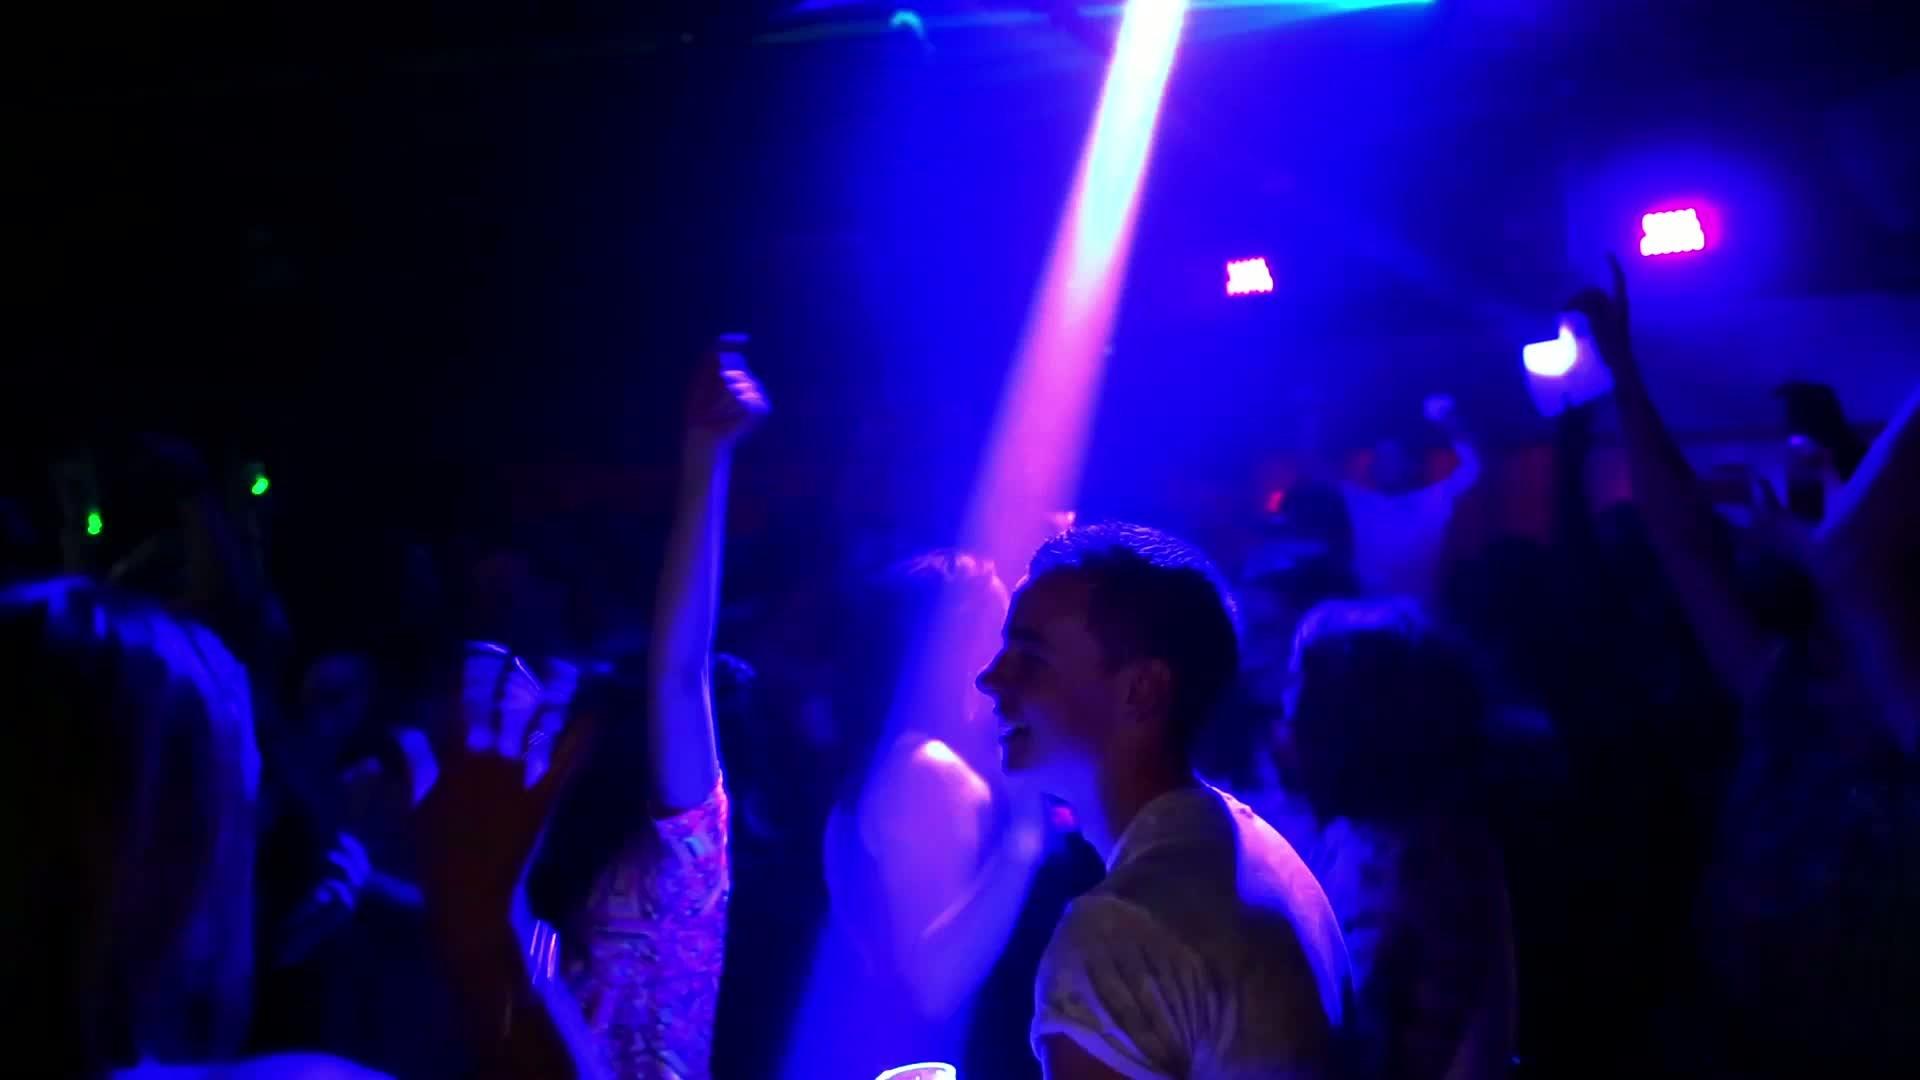 Nightclub Smoke Machine + Dancing Free Stock Video Footage Download Clips